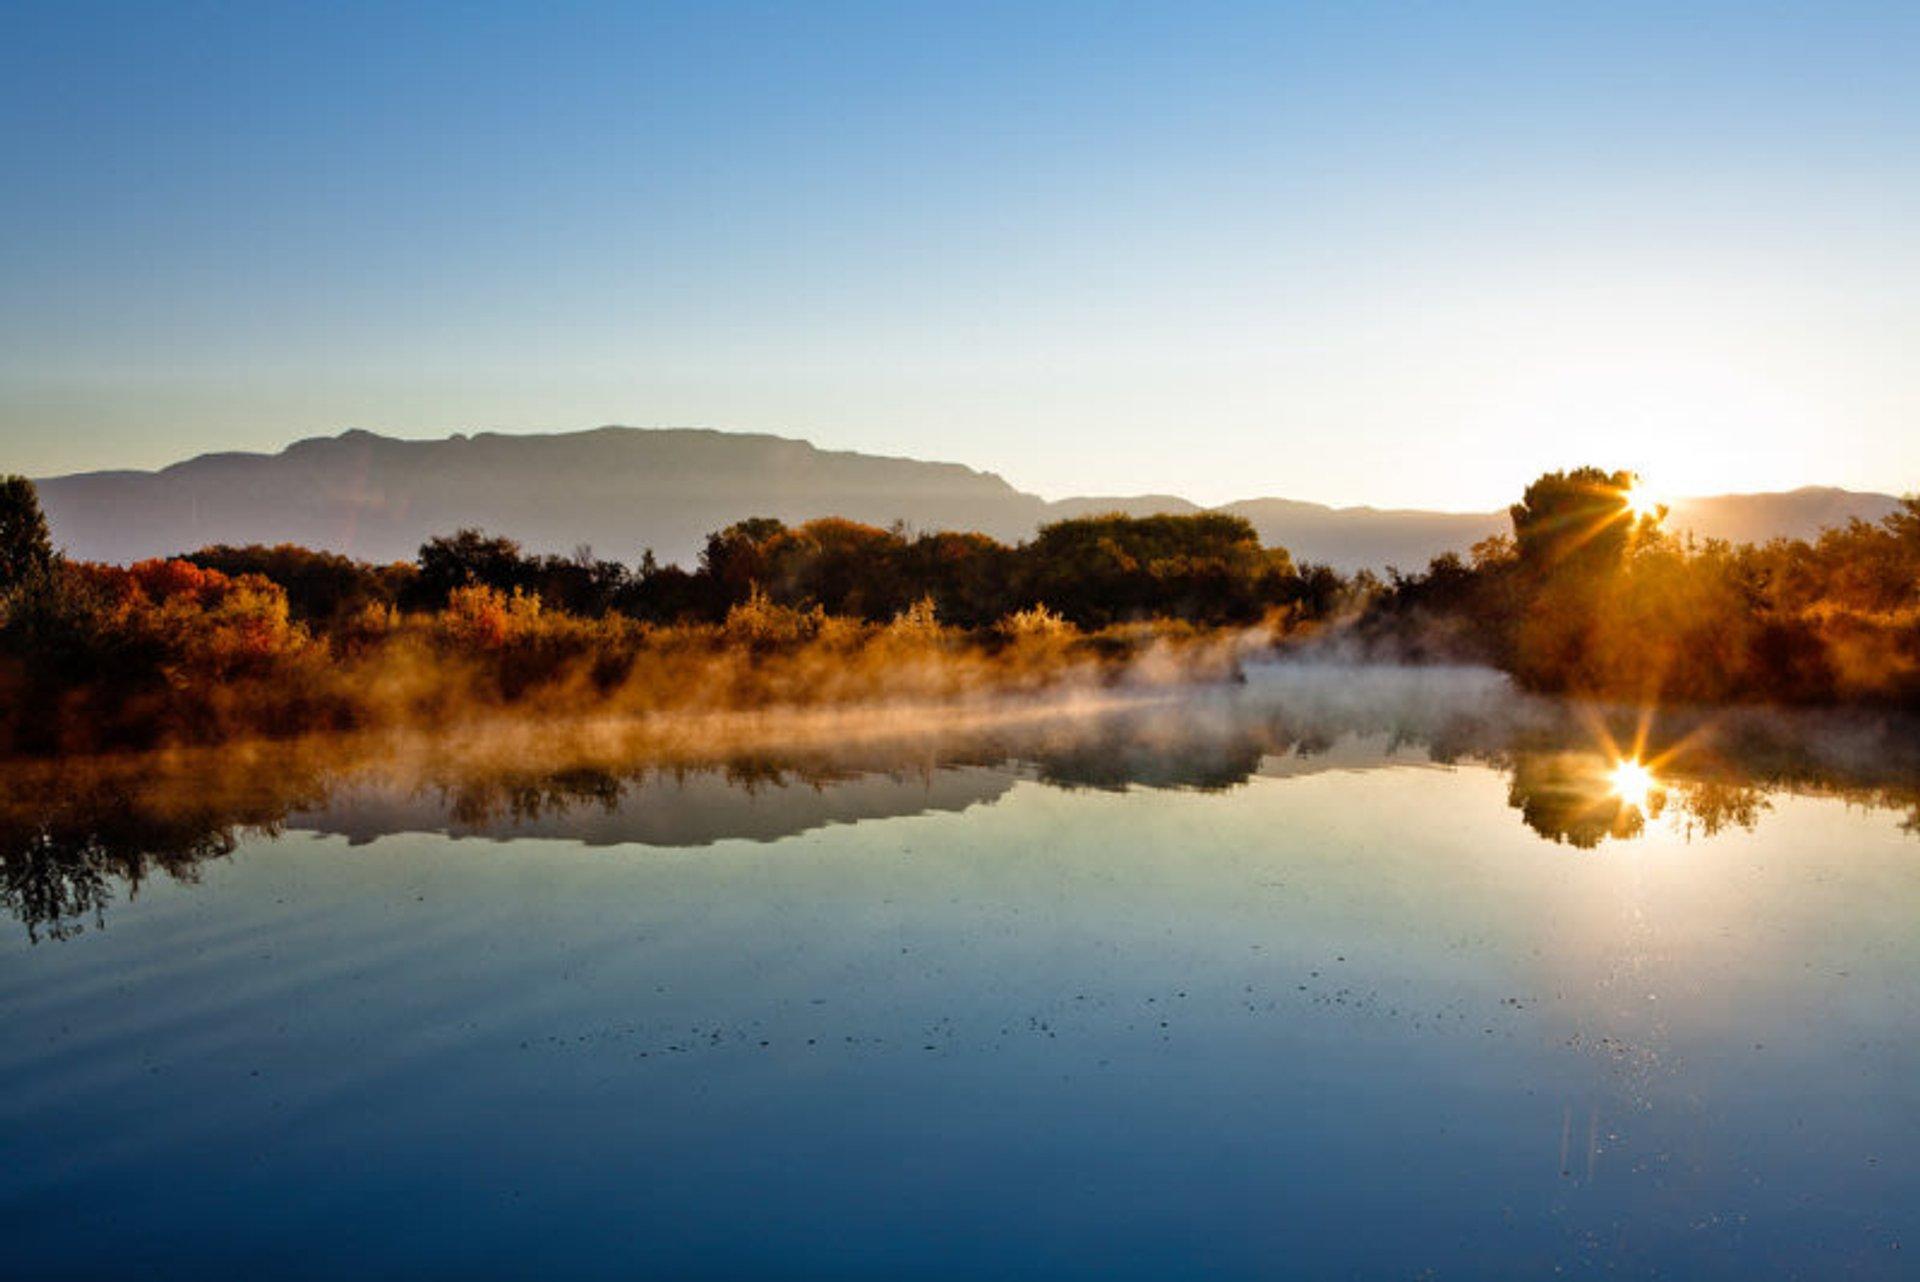 Alameda Wetlands preserve in the North Valley of Albuquerque 2020